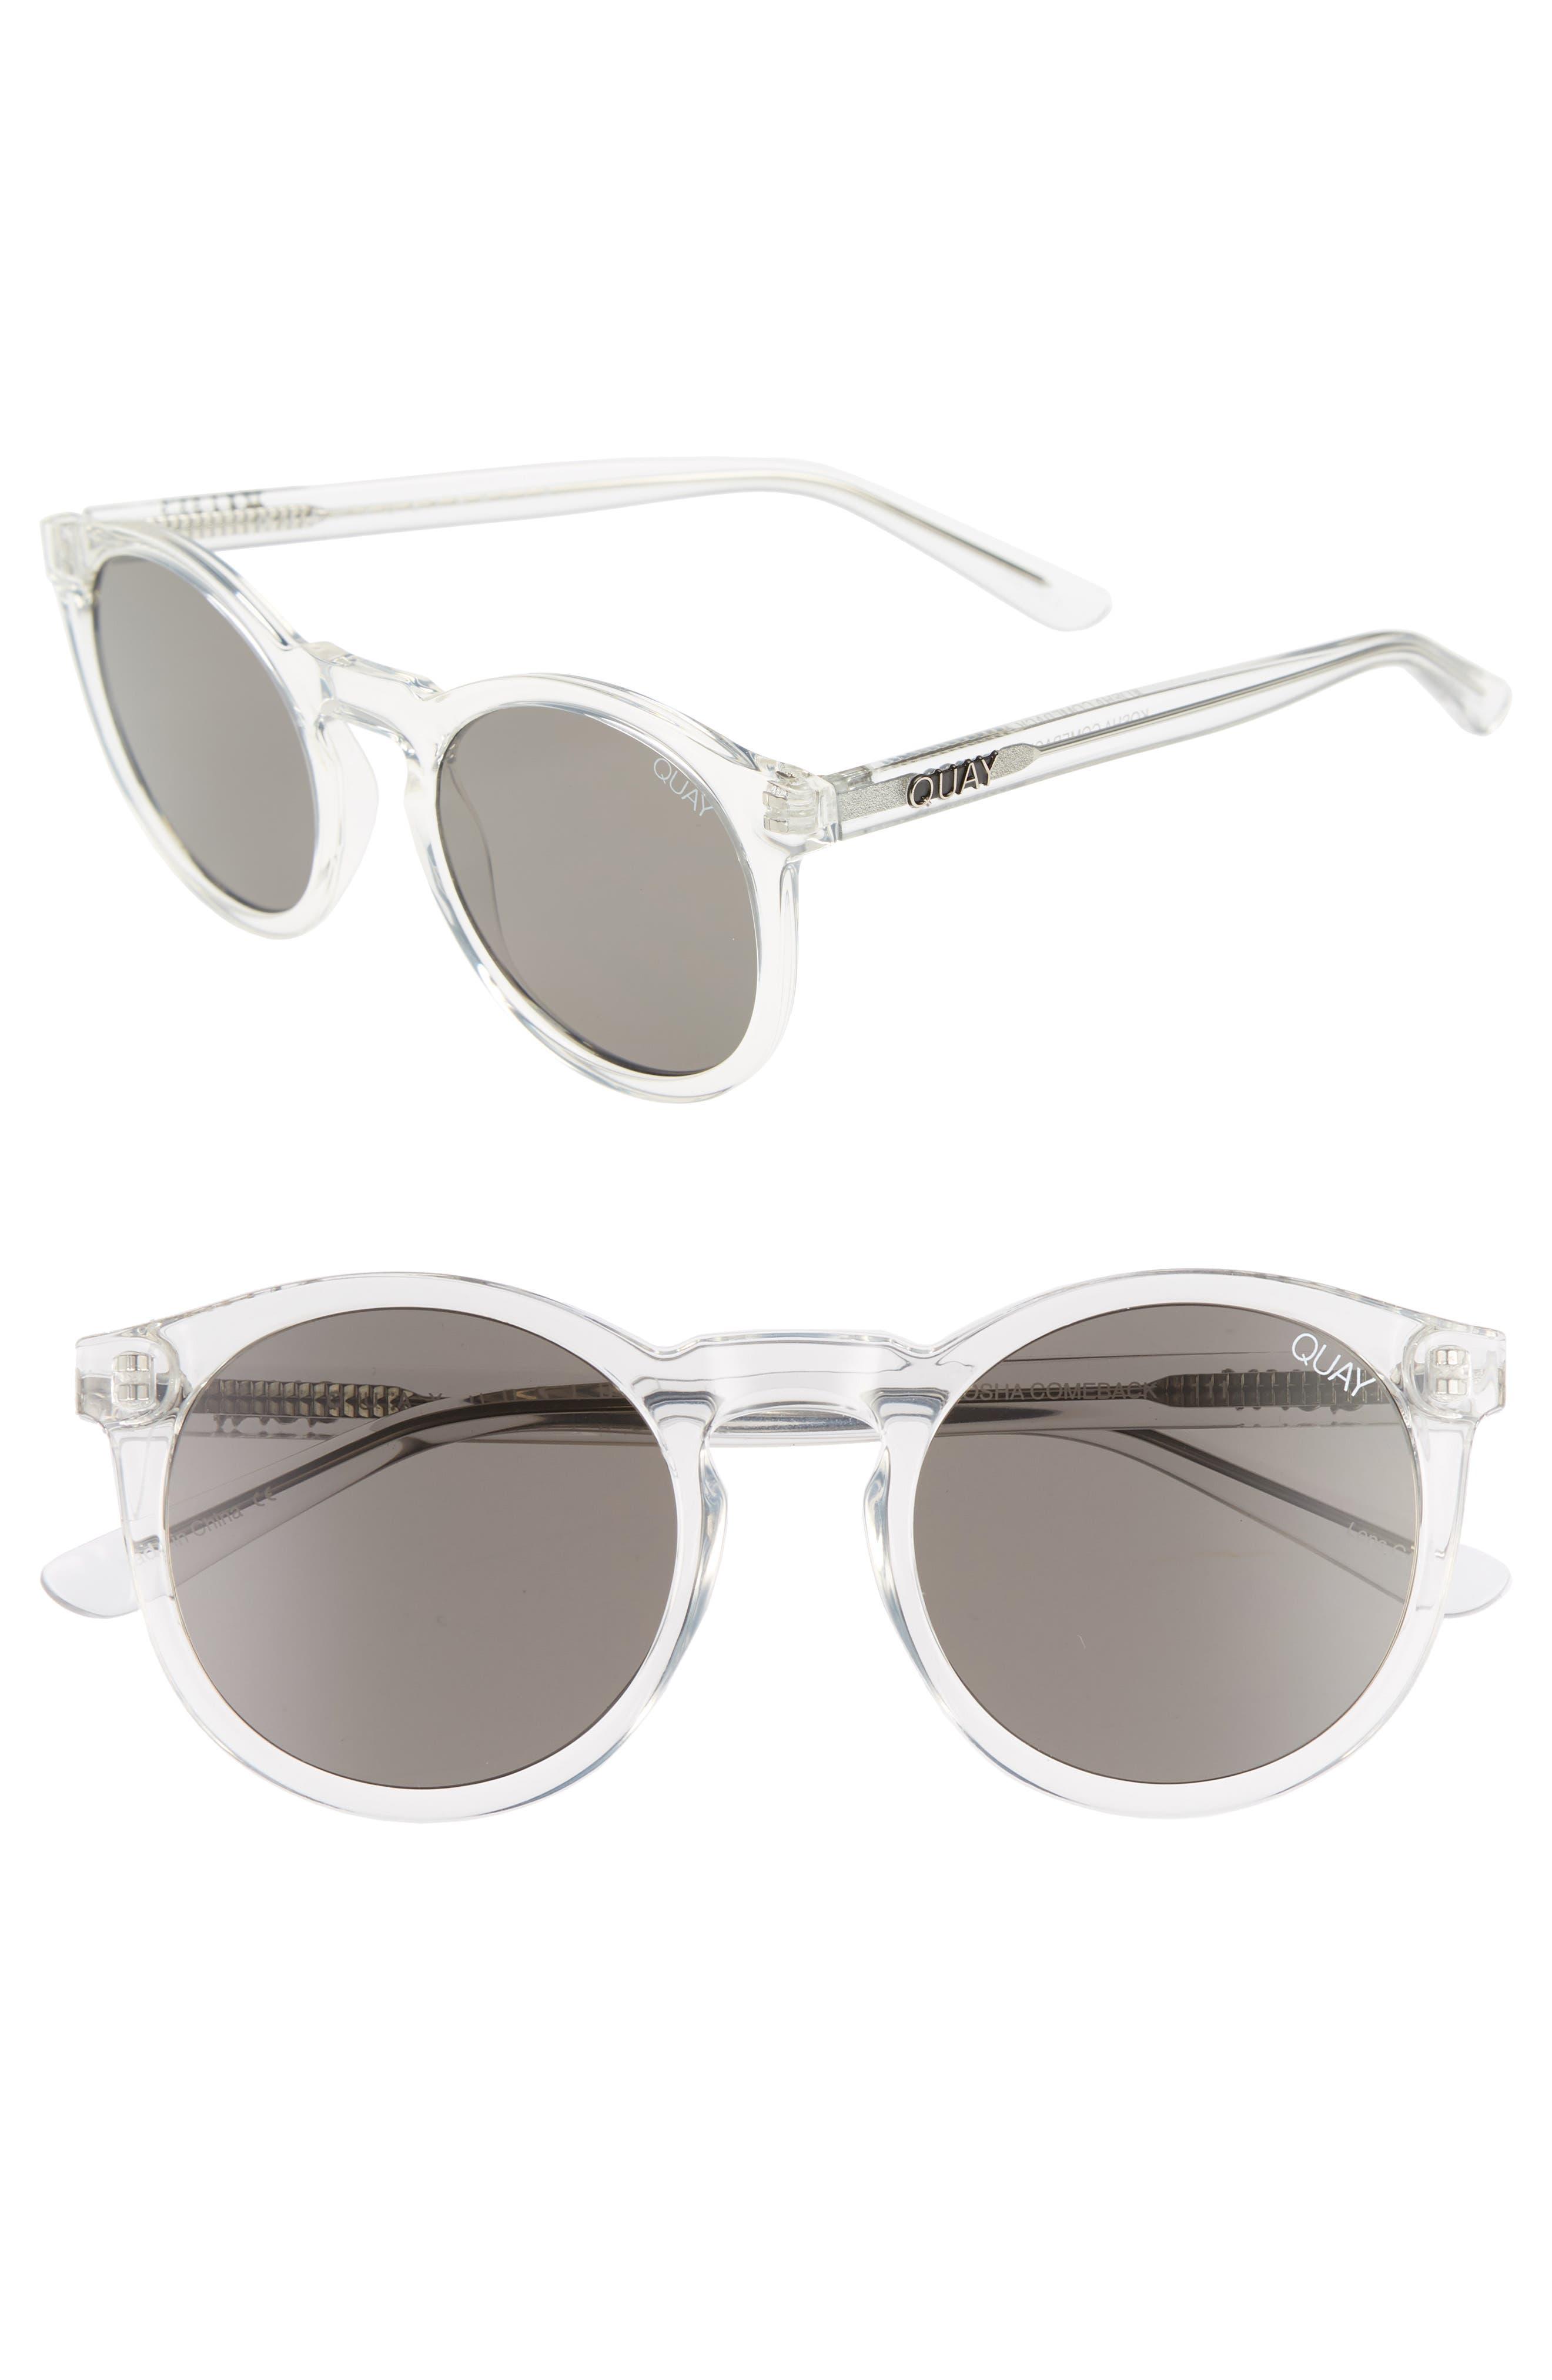 Kosha 49mm Round Sunglasses,                         Main,                         color, Clear/ Smoke